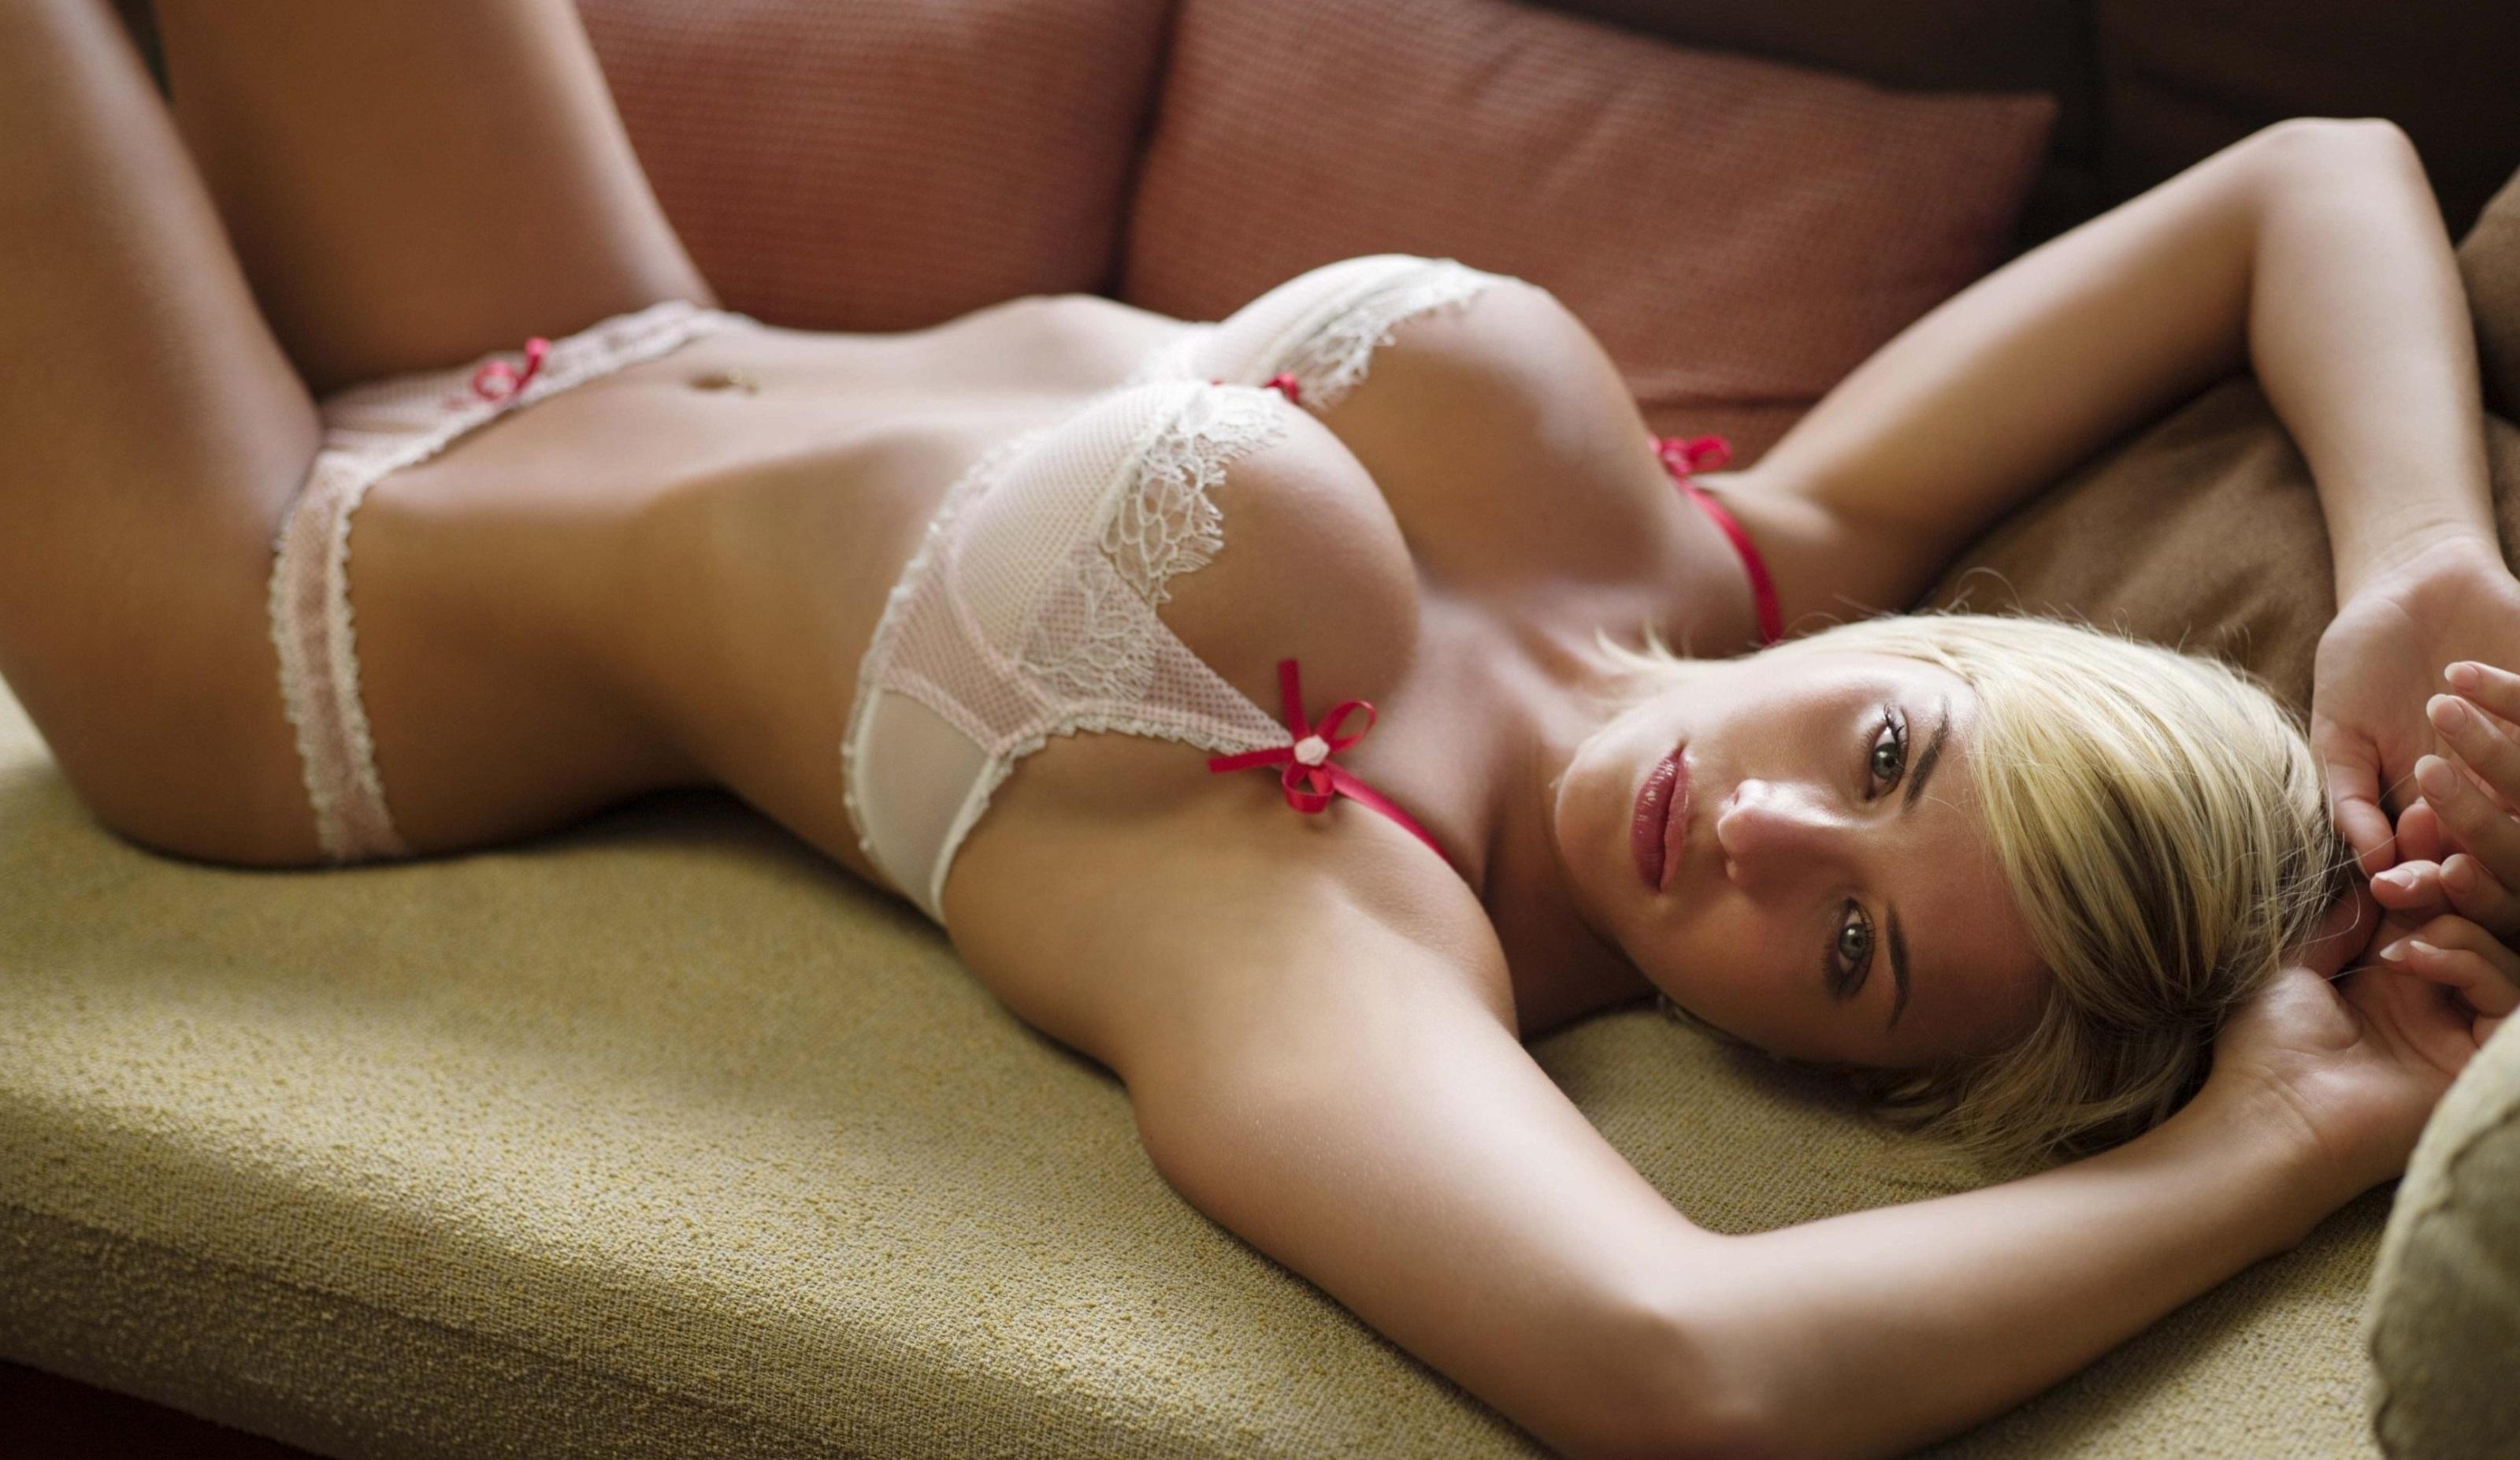 Erotic Pictures Meet asian dating singles site women